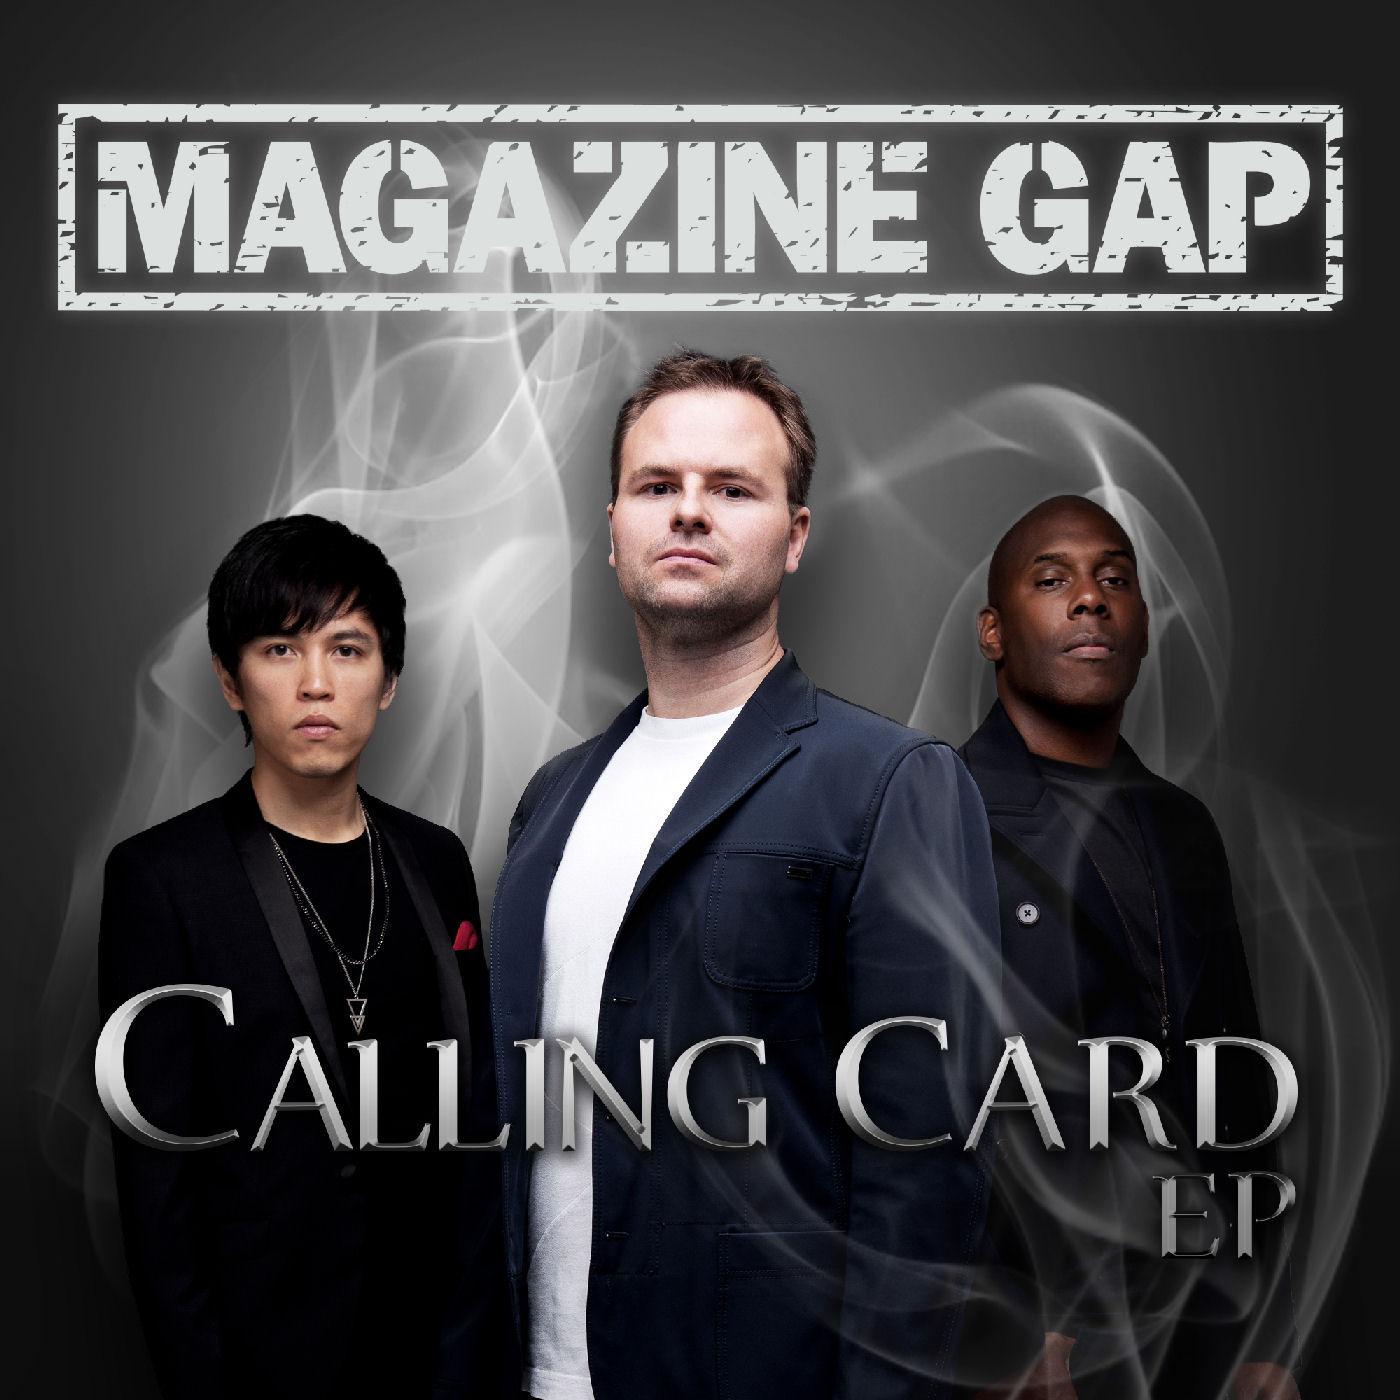 Magazine Gap – Calling Card